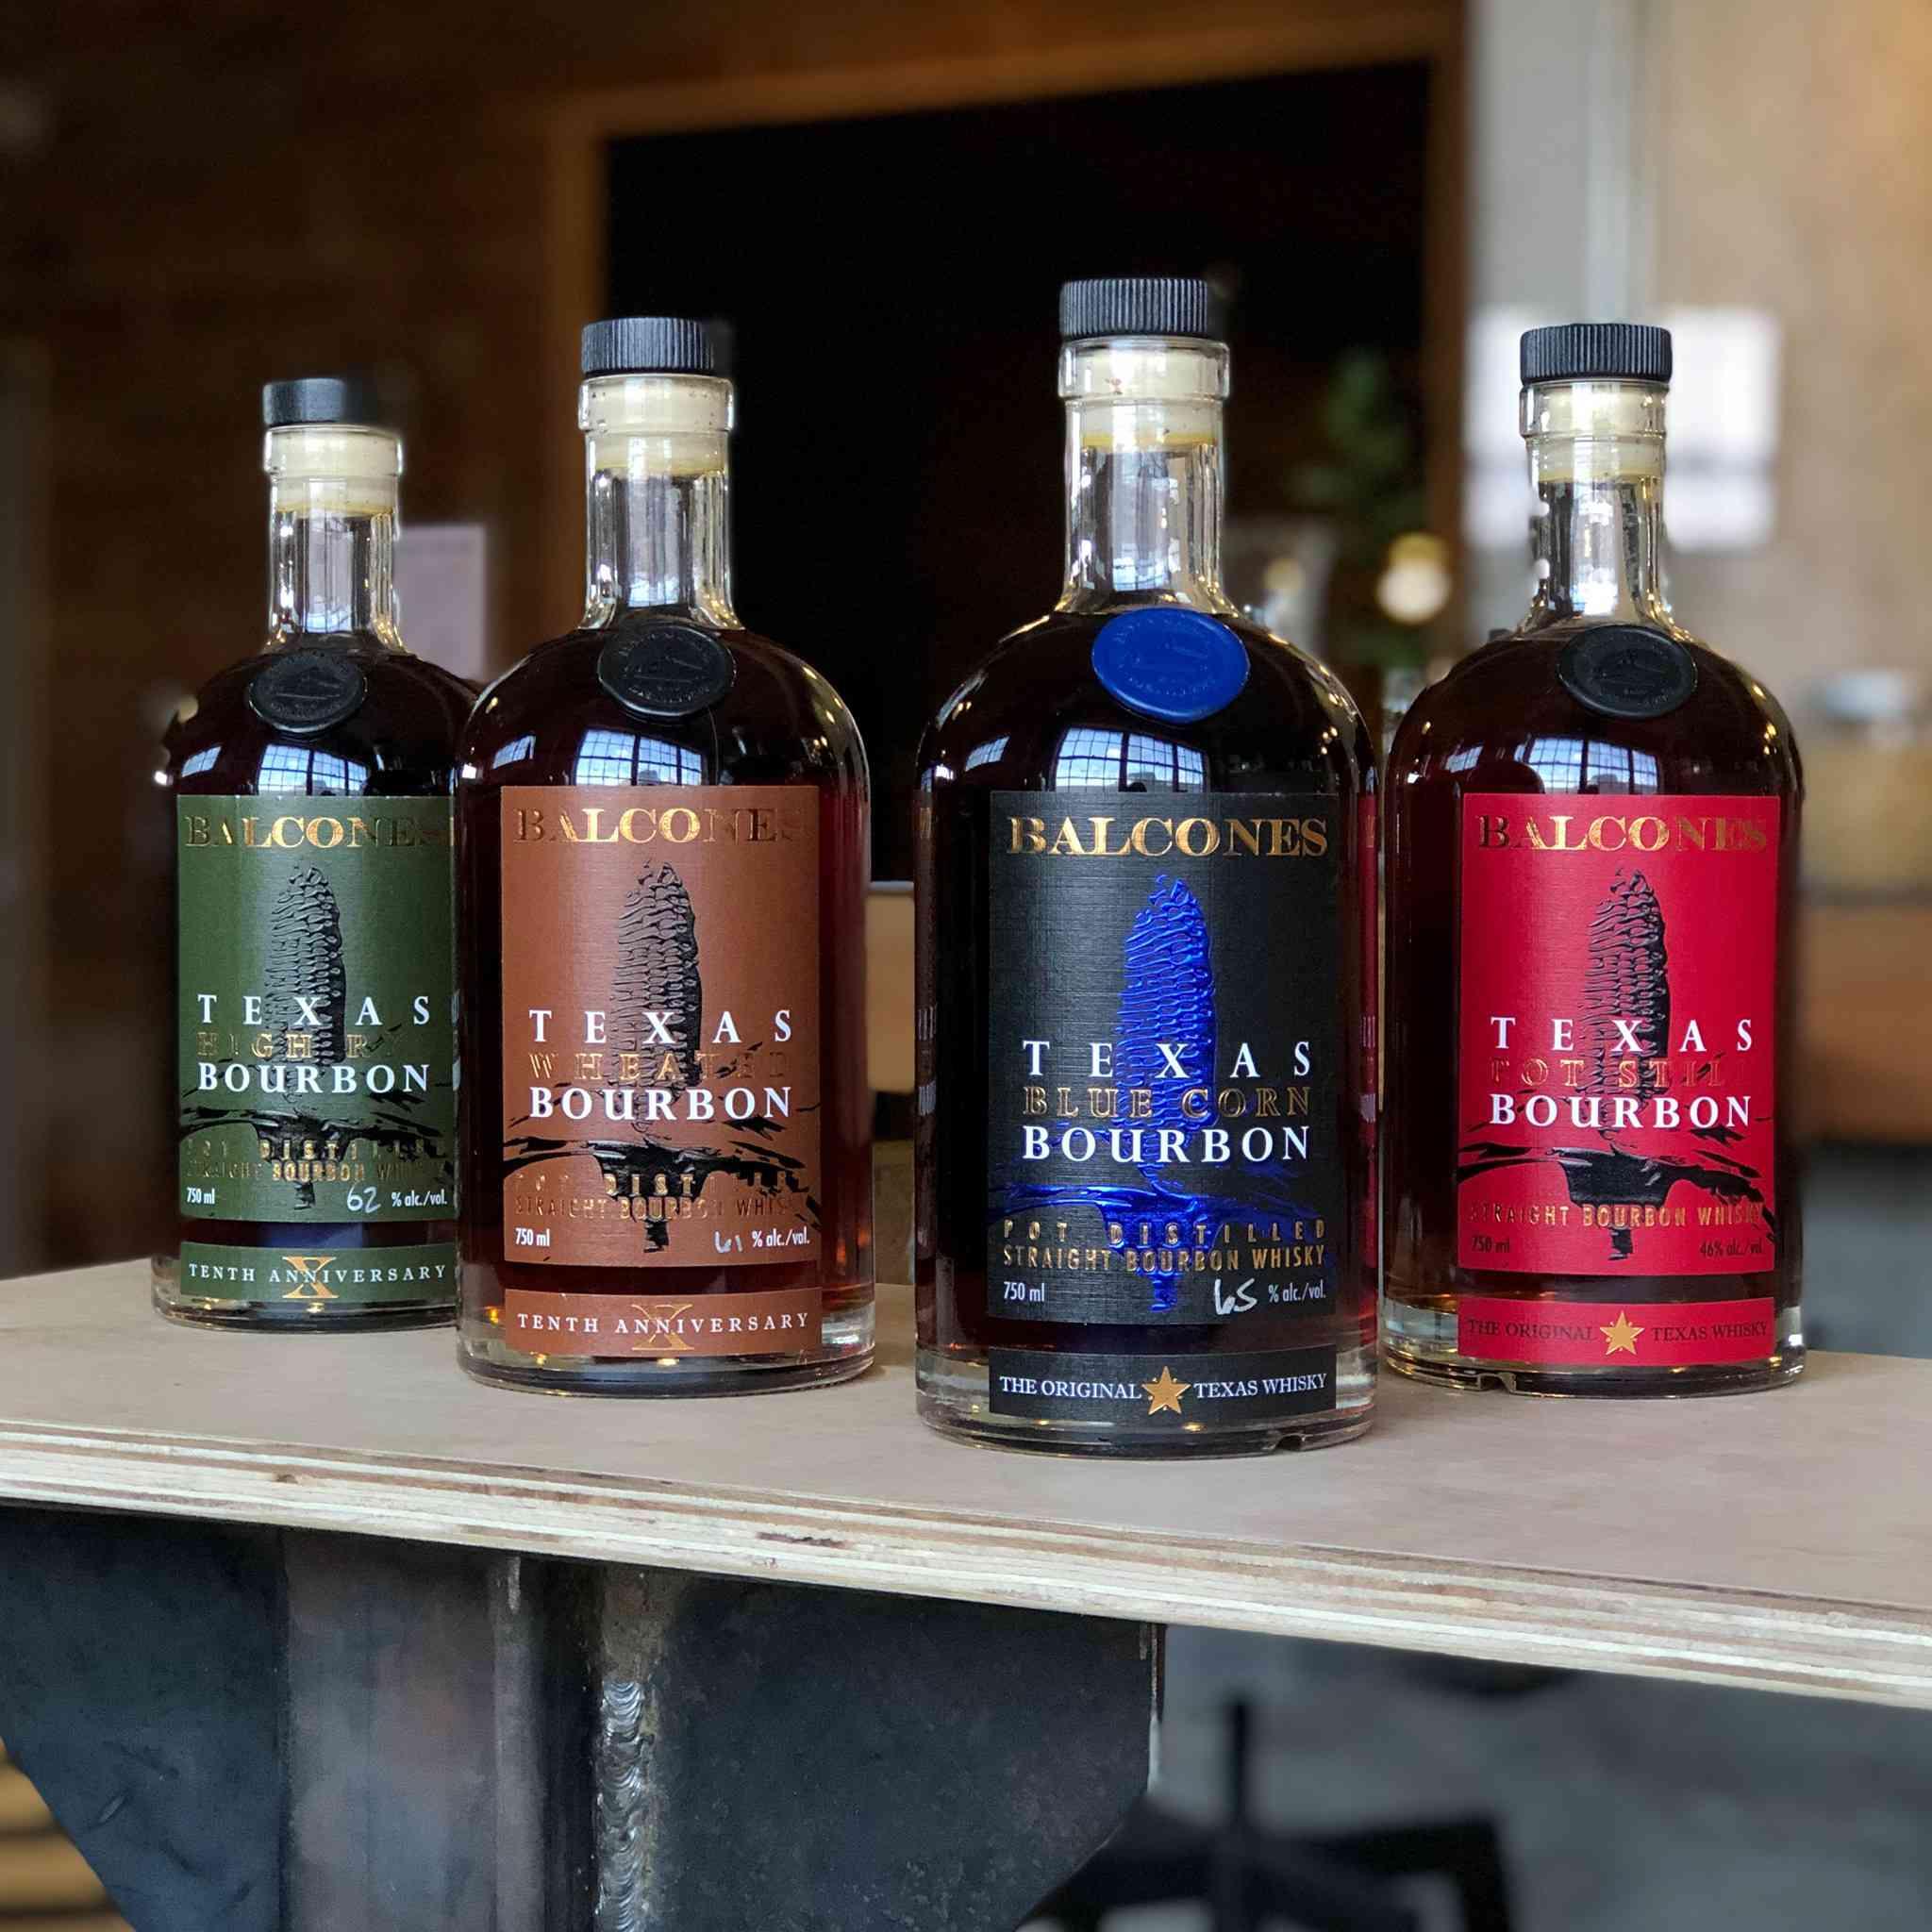 Four bottles of Bourbon from Balcones distillery